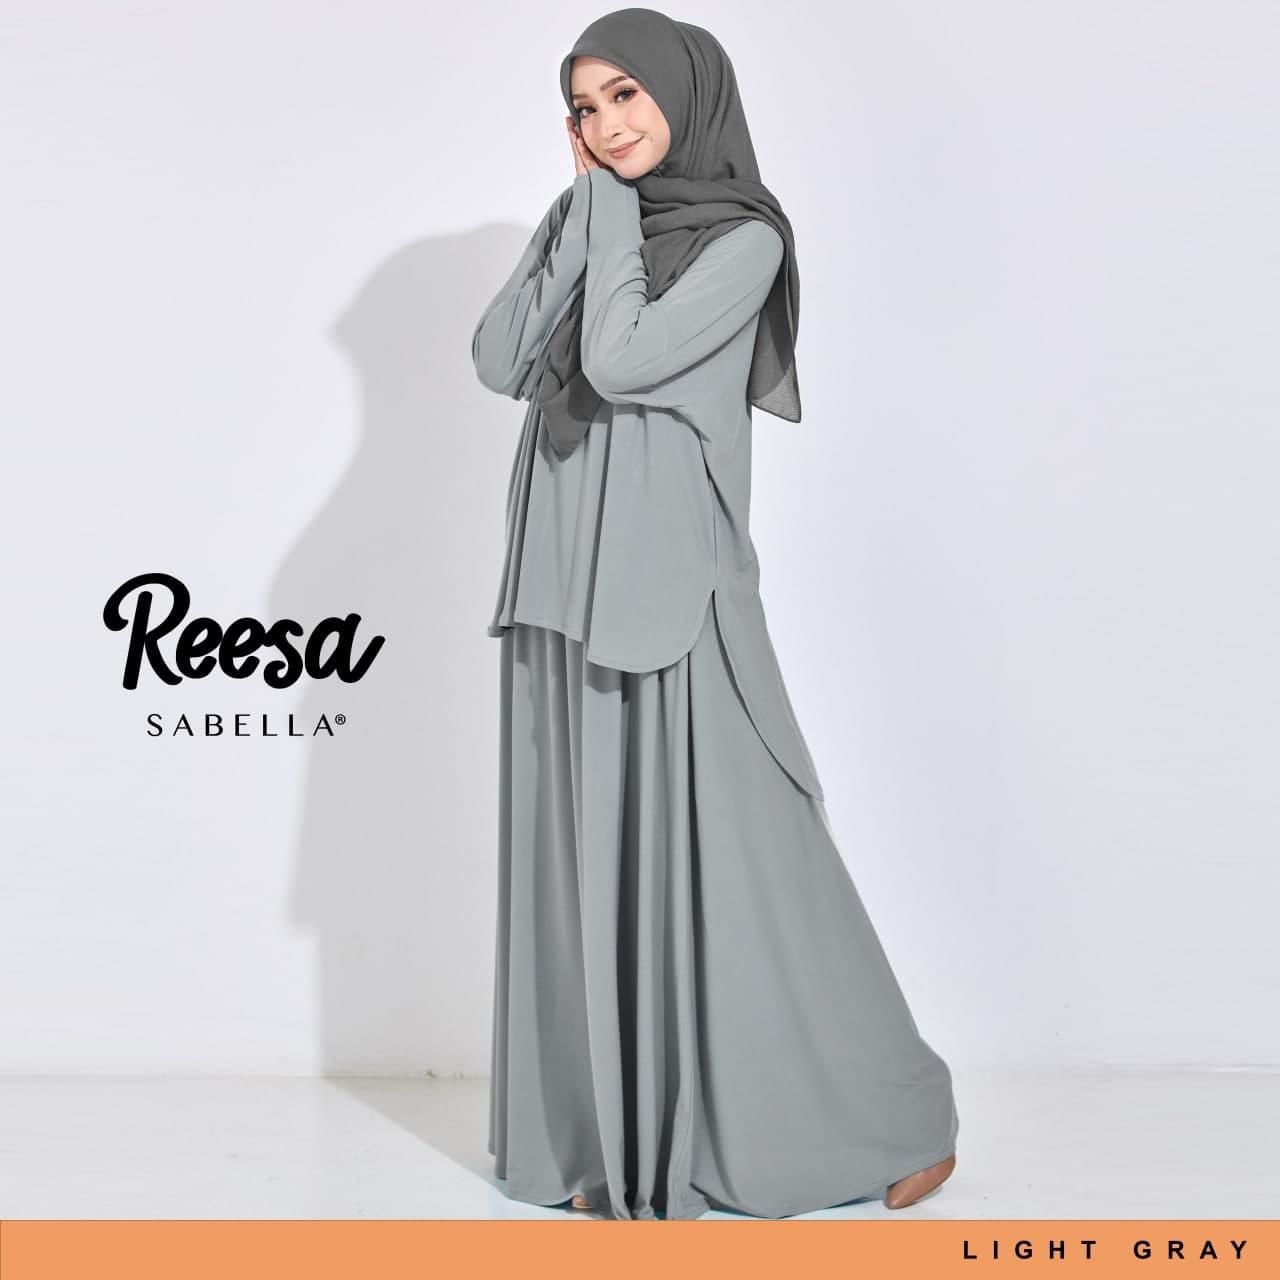 Reesa 4.0 Light Gray